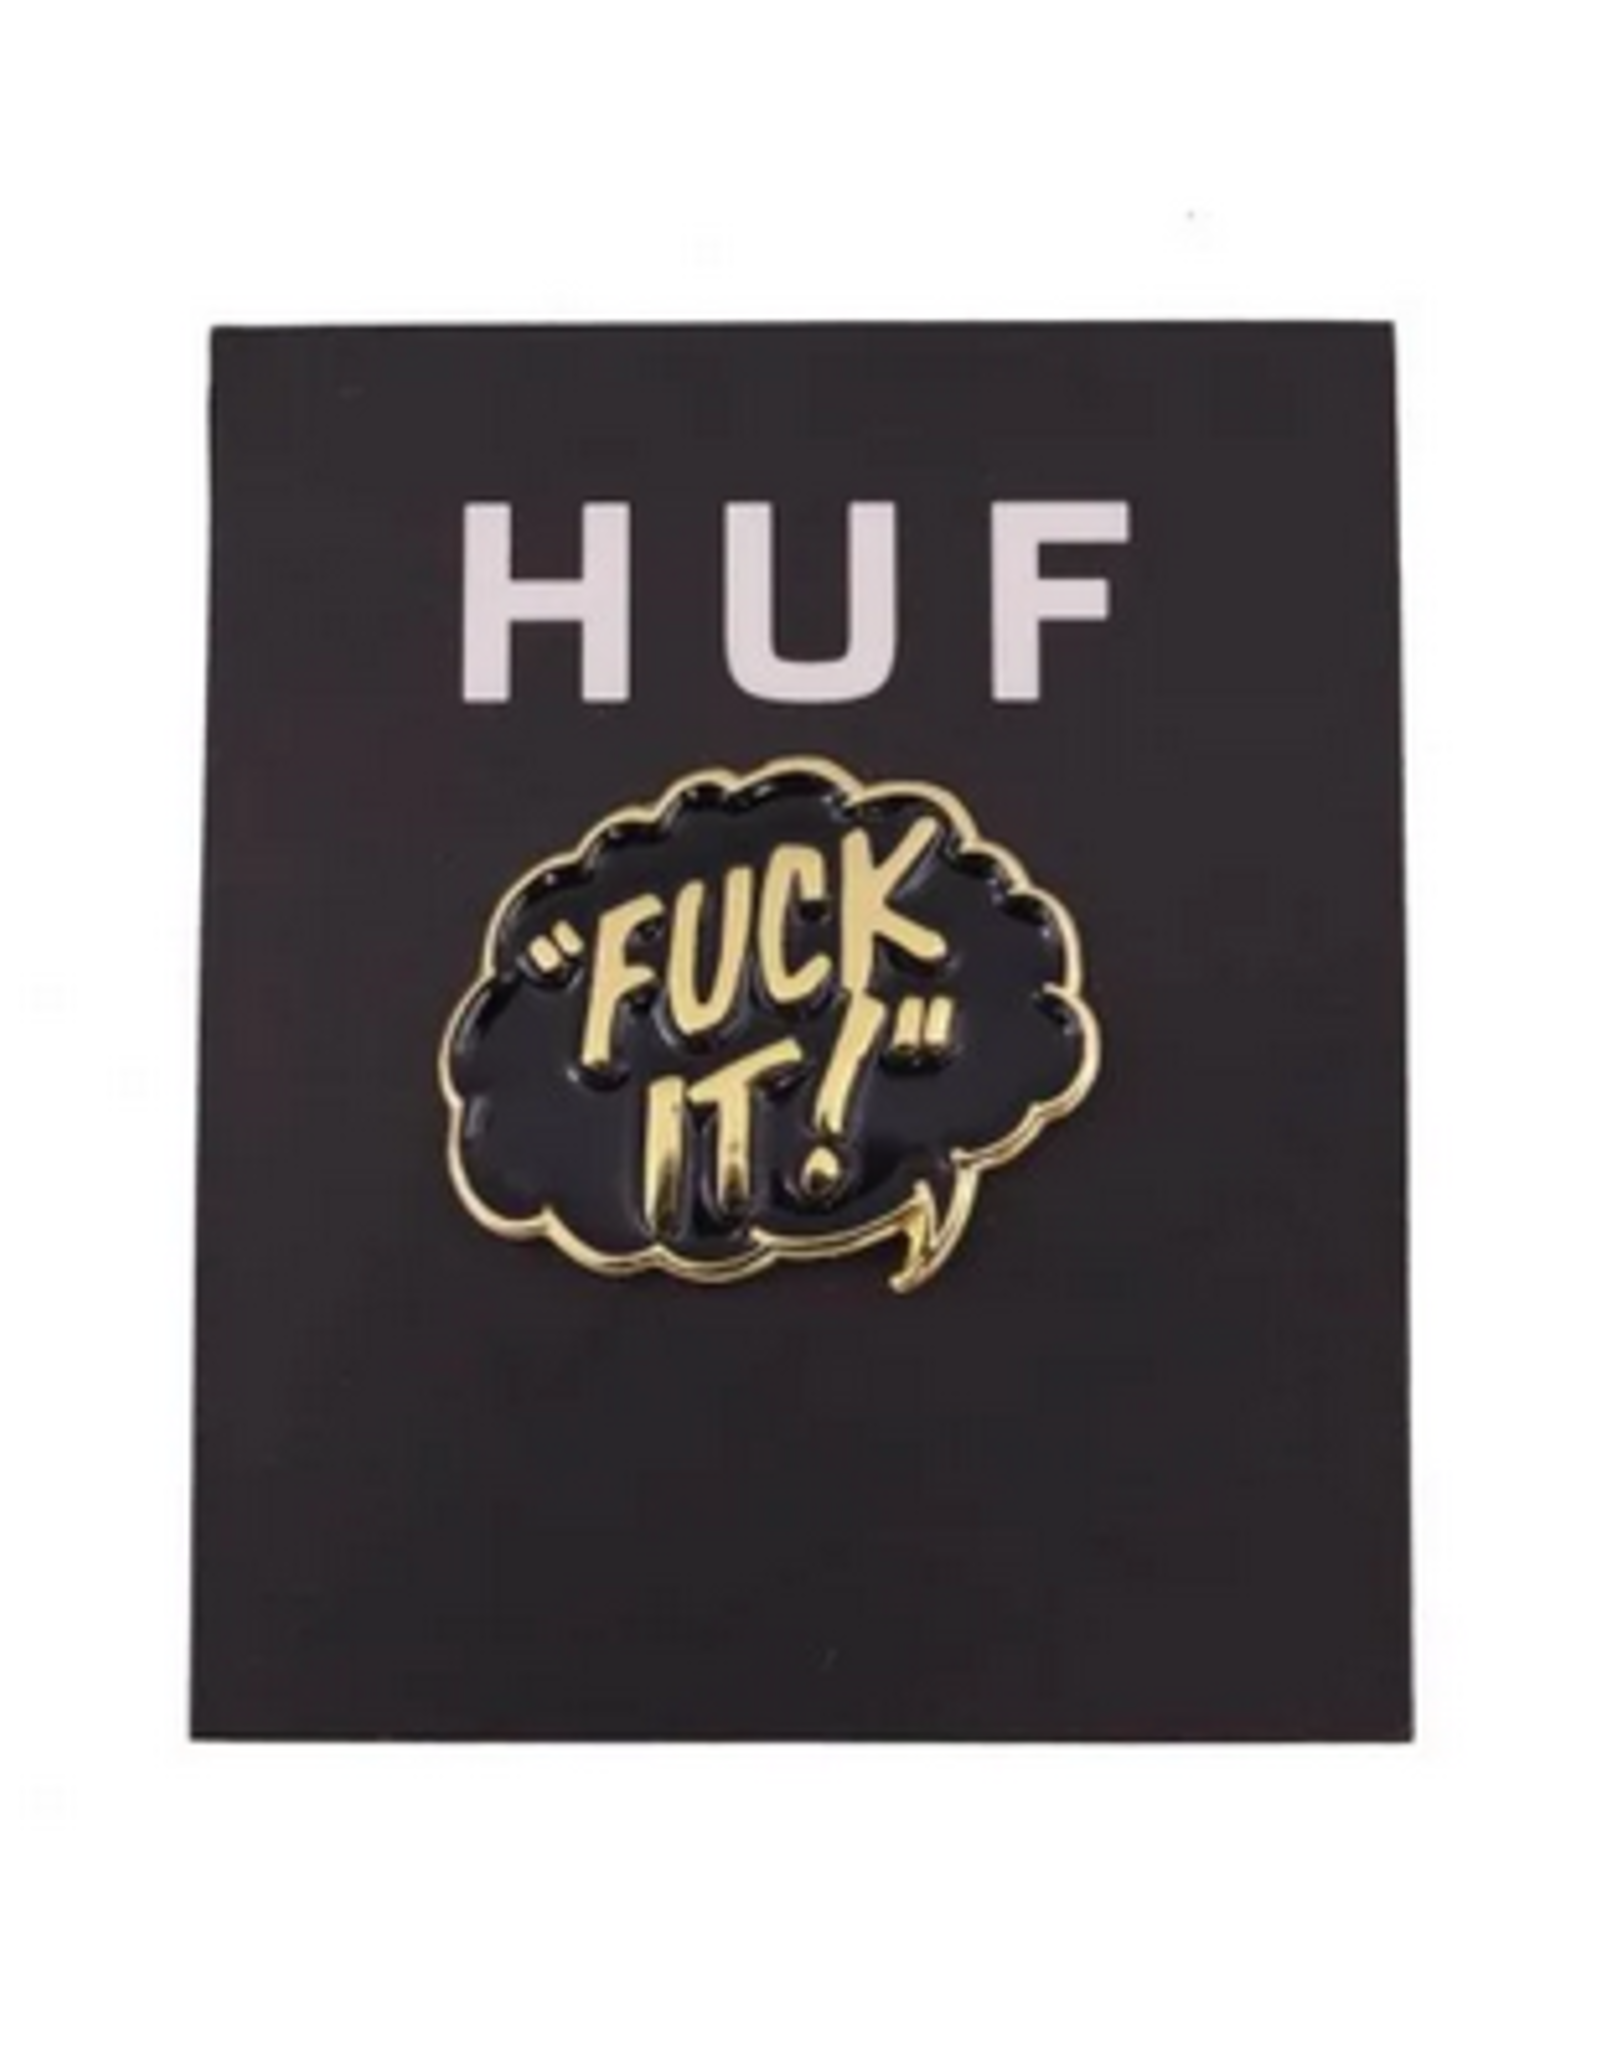 HUF HUF FUCK IT LABEL PIN